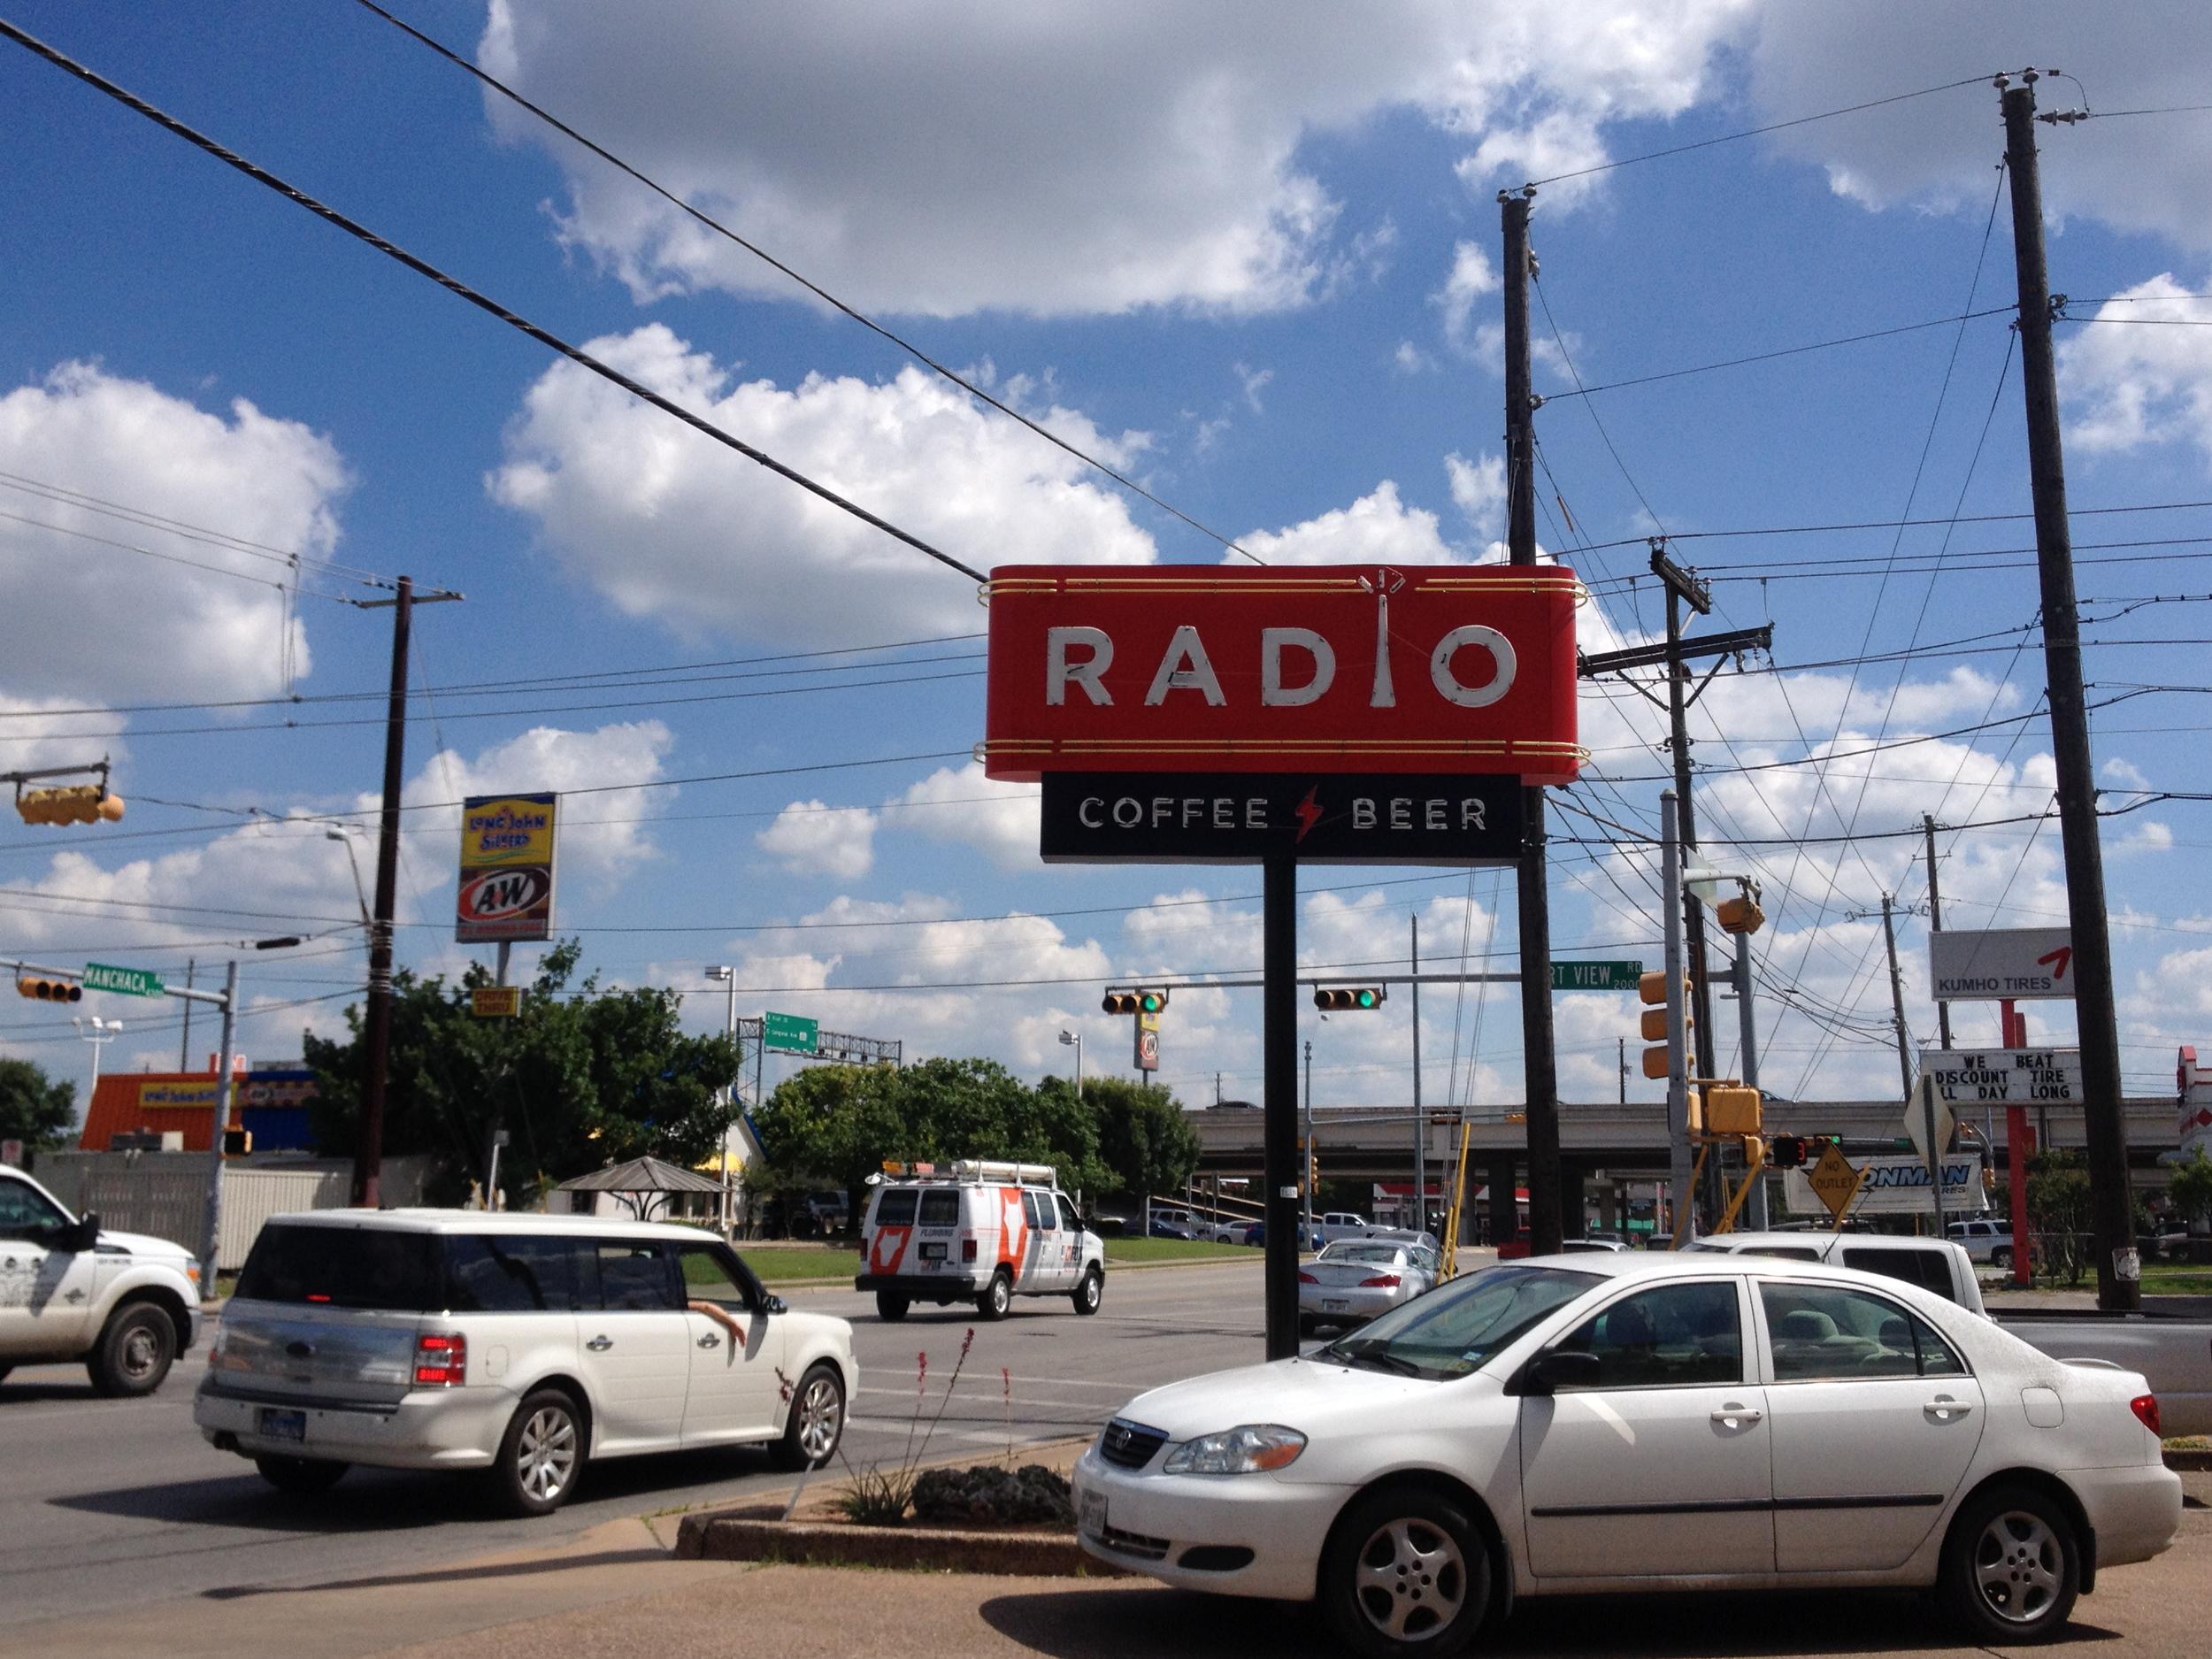 radiosign.jpg